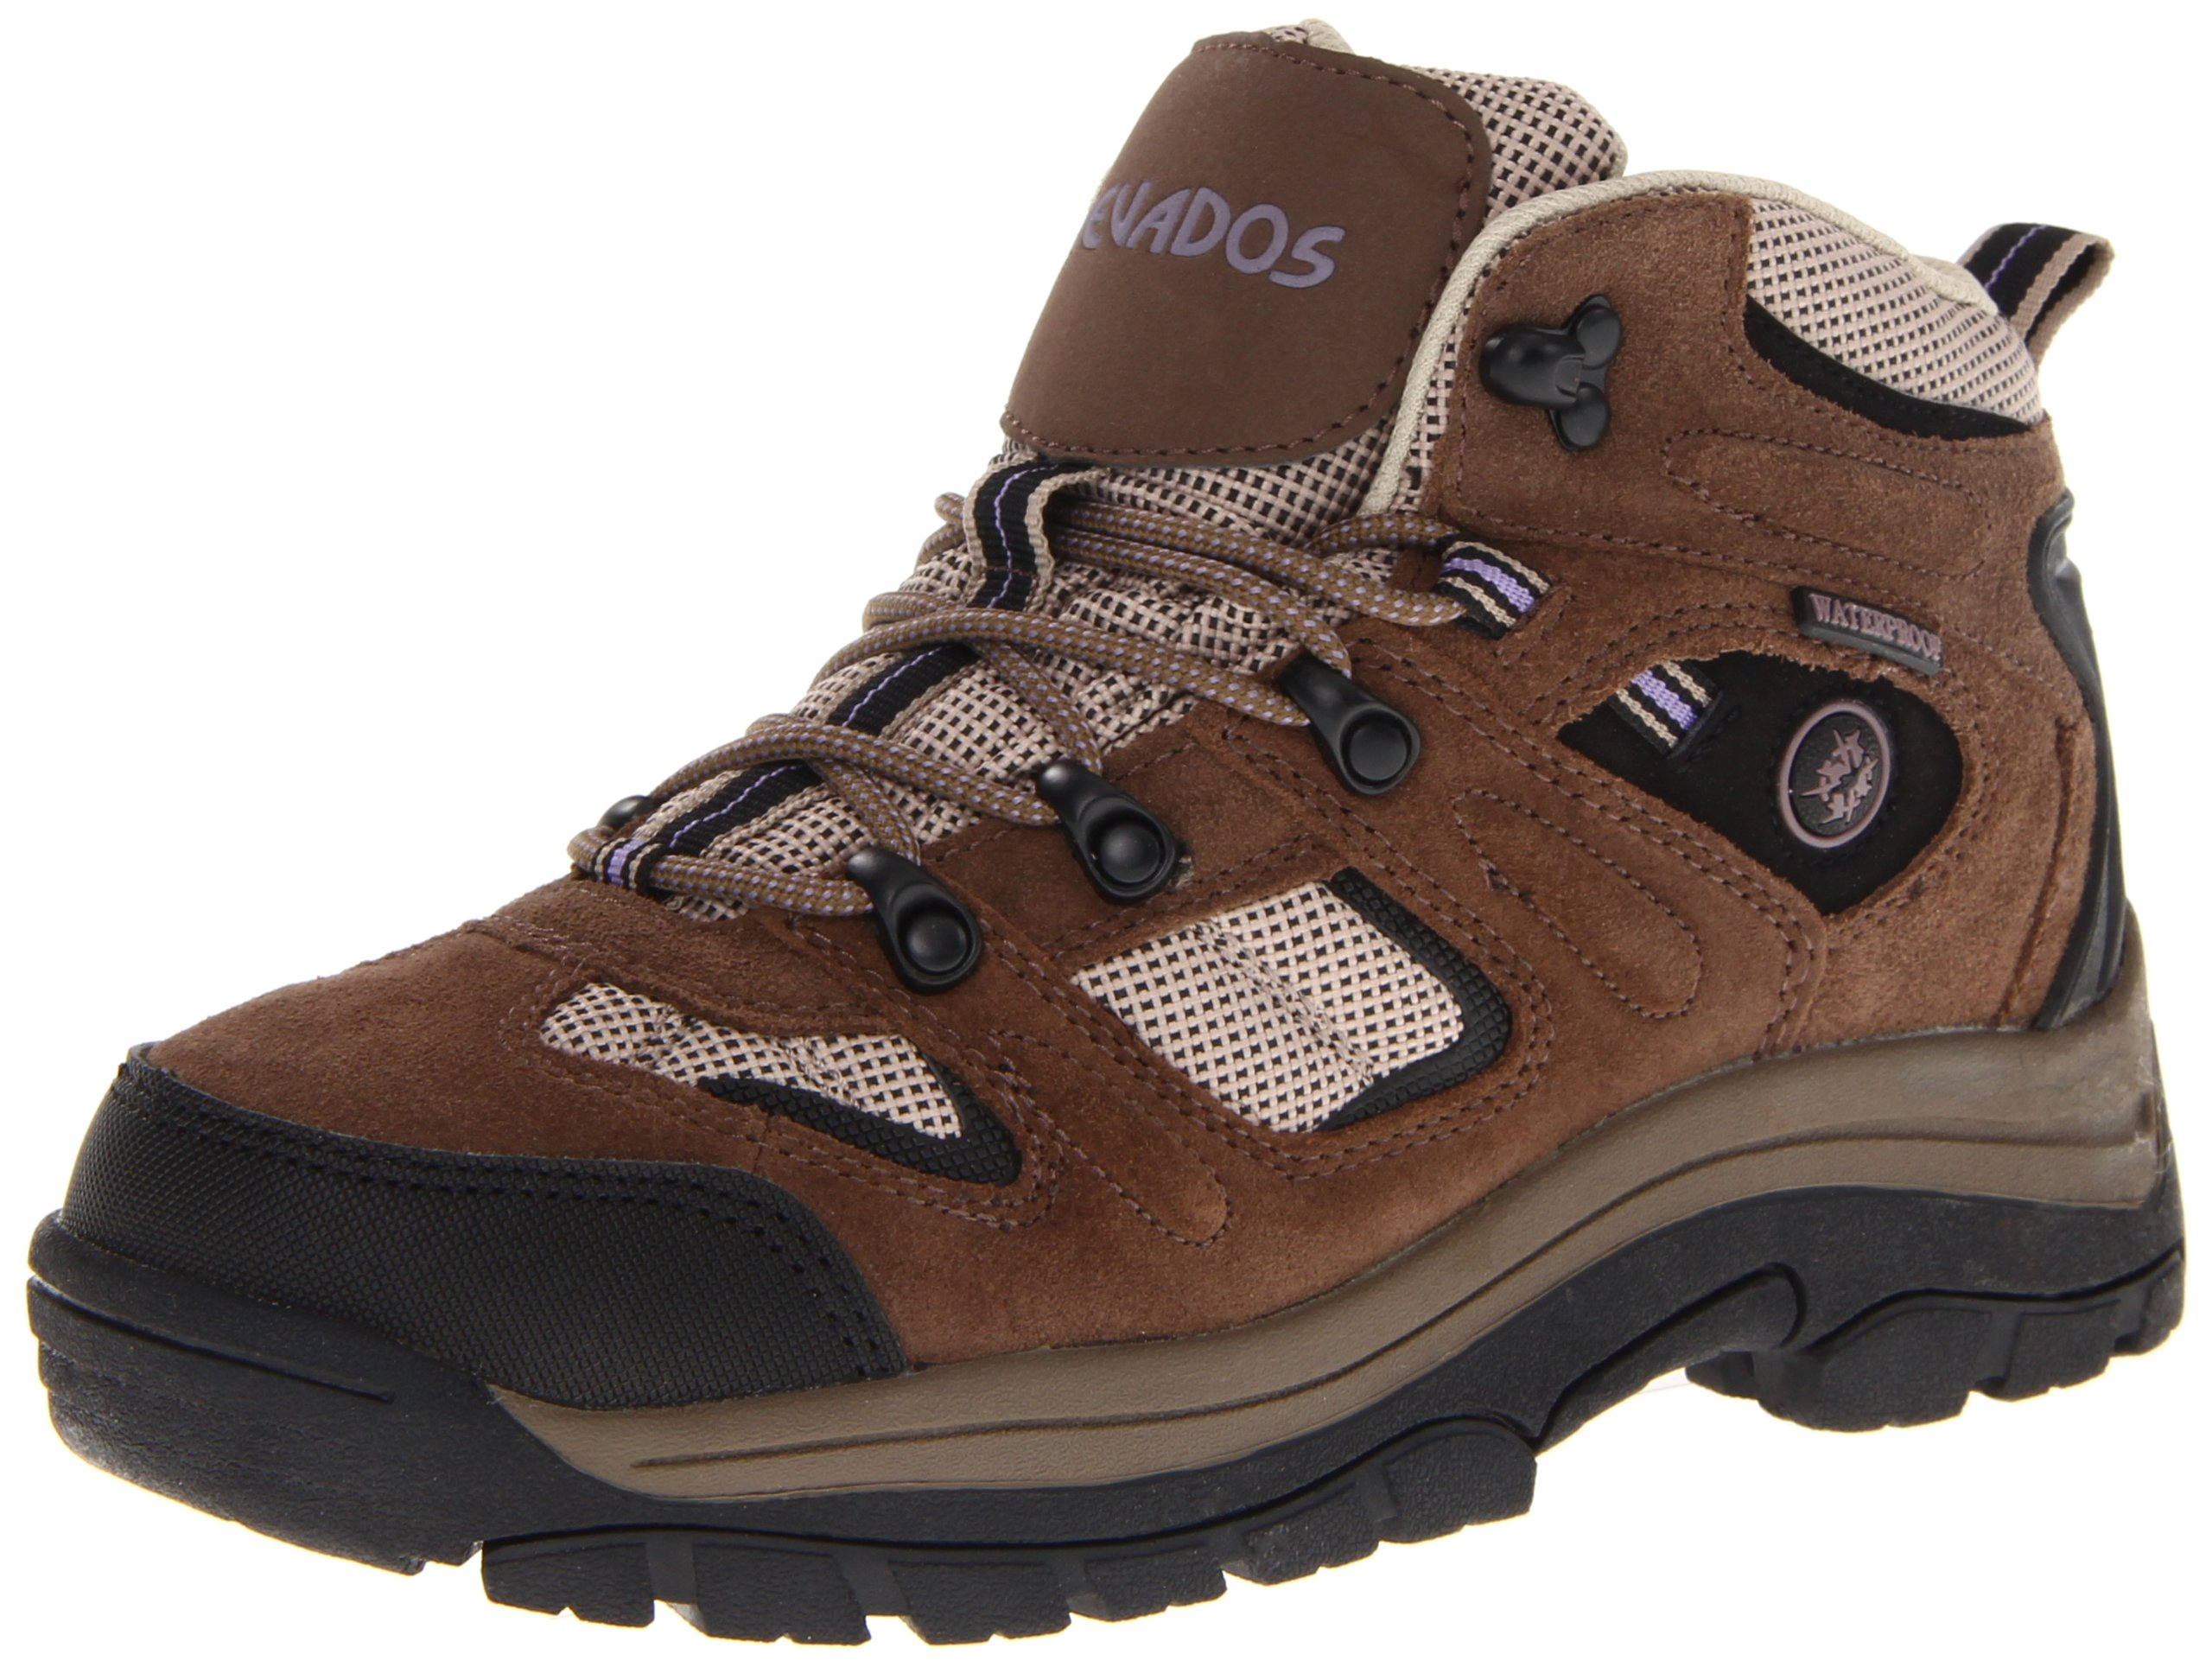 Nevados Women's Klondike Waterproof V1173W Hiking Boot,Dark Brown/Black/Taupe,9.5 M US by Nevados